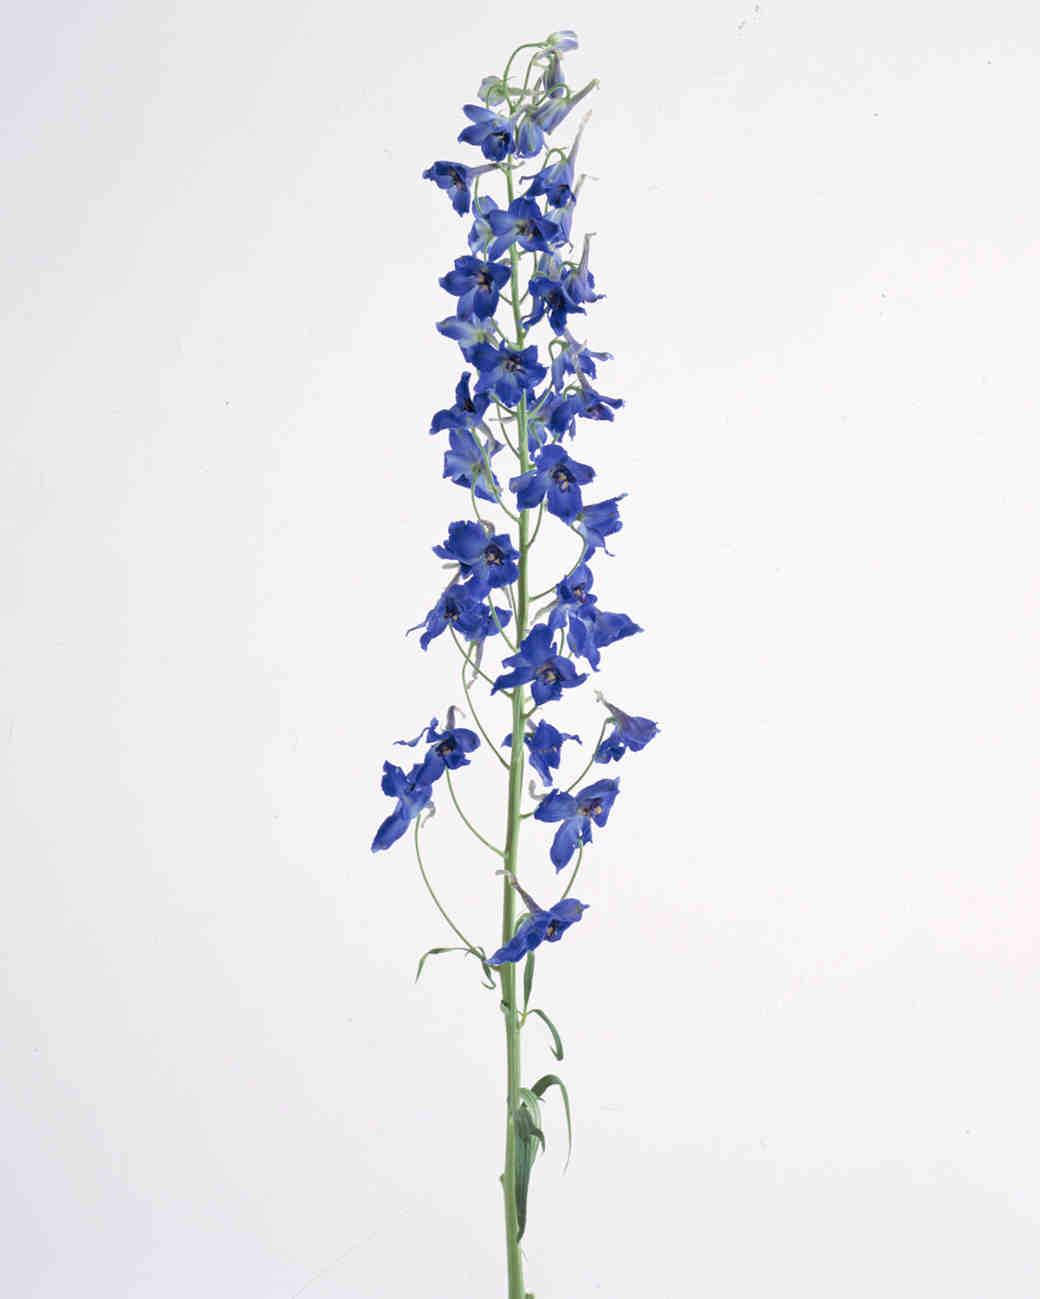 flower-glossary-delphinium-a98432-0415.jpg